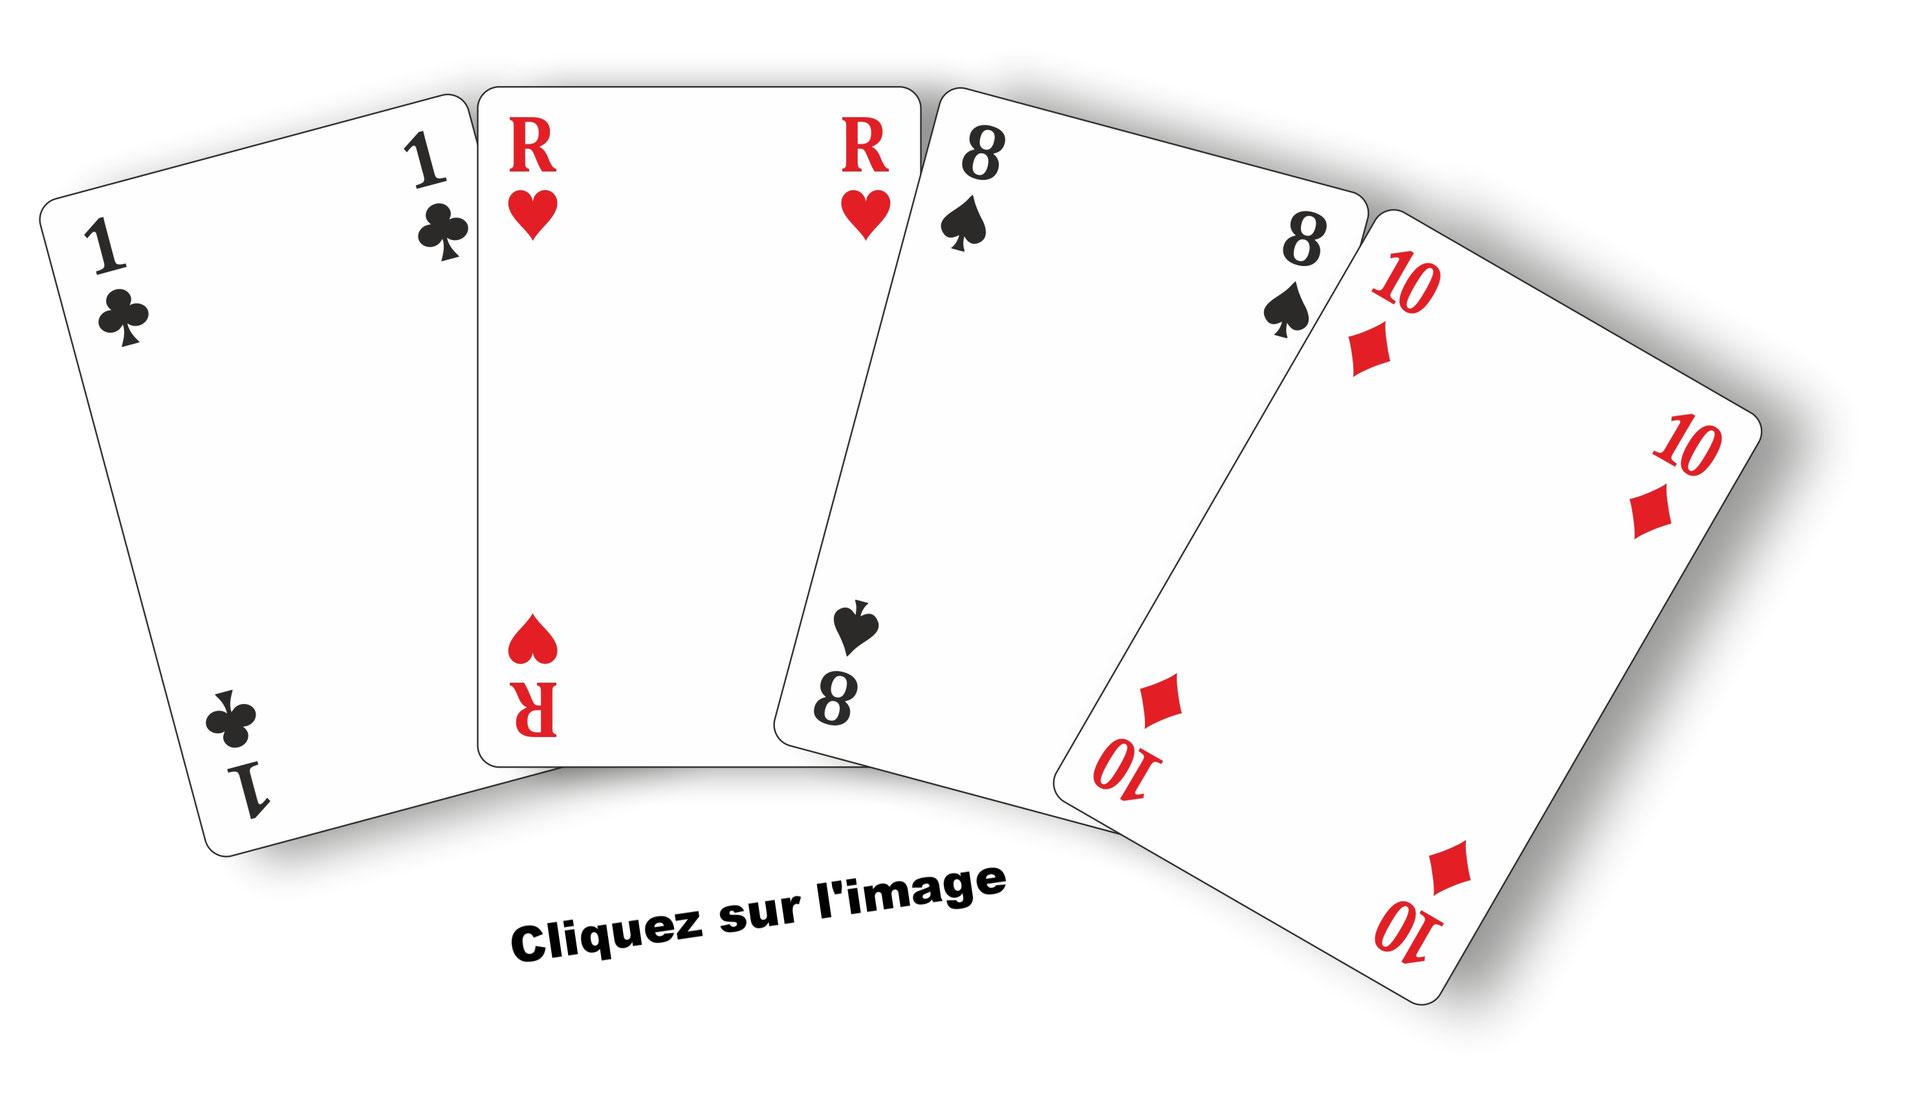 Jeux De Cartes A Imprimer Dragono Fr